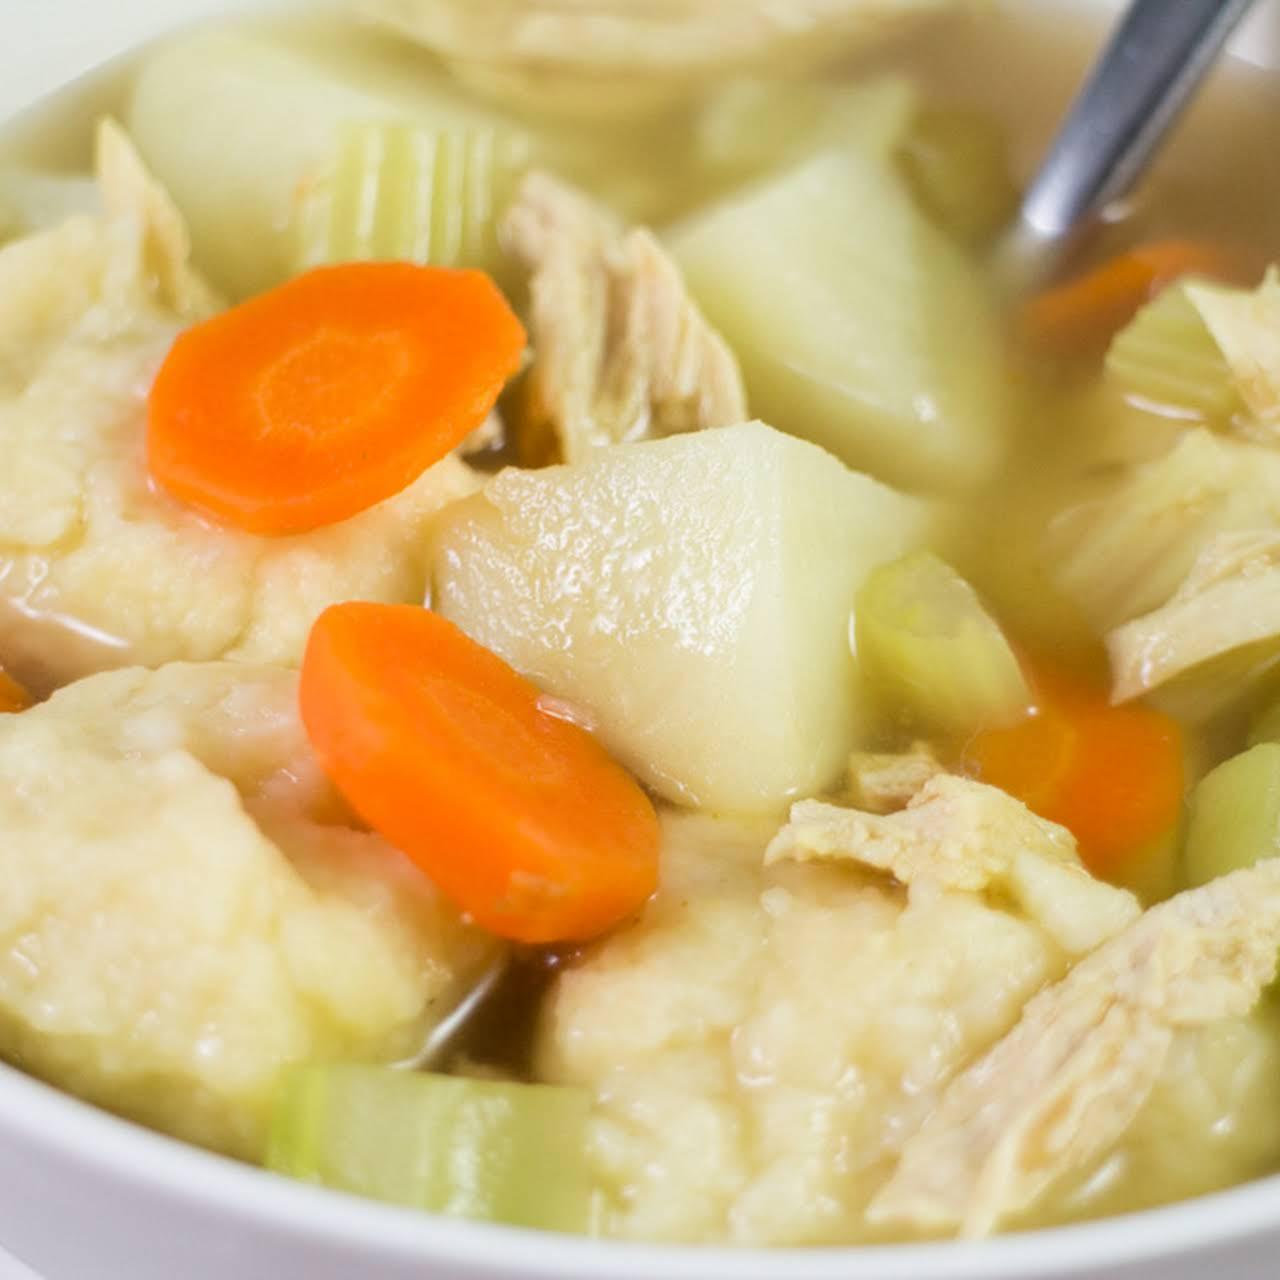 Shredded Chicken Dumpling Soup